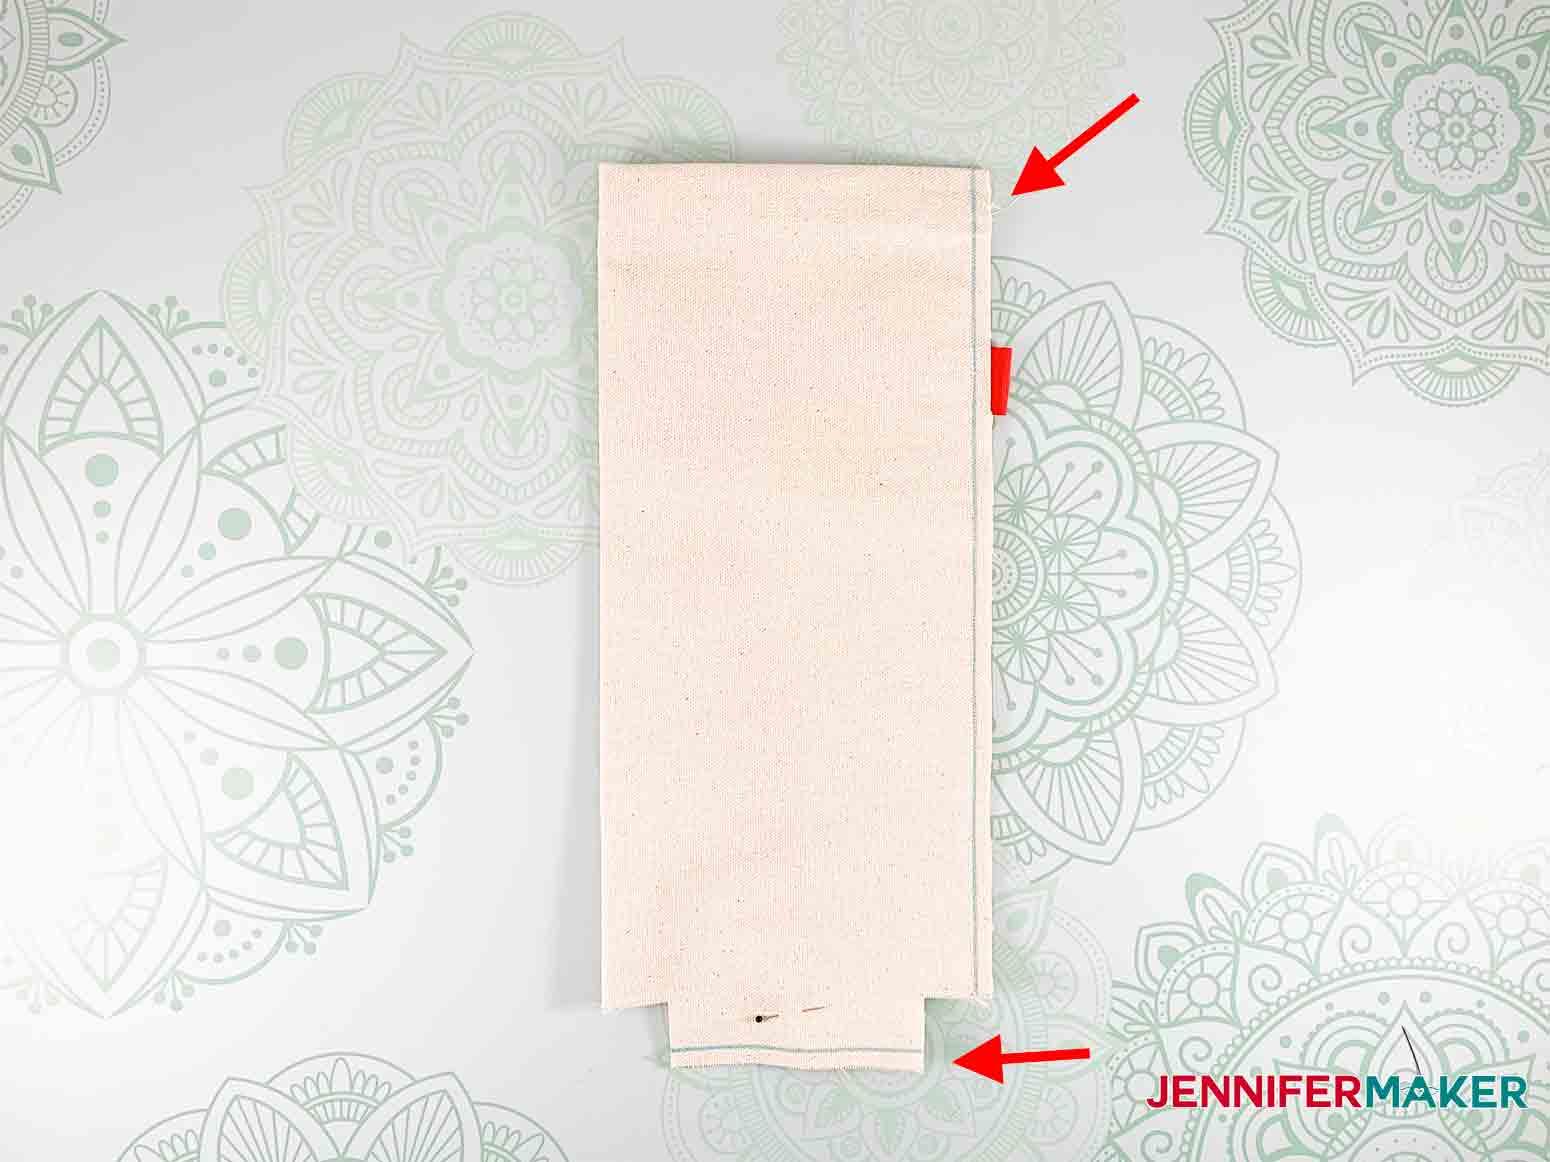 Festive-Holiday-Wine-Totes-JenniferMaker-fold-sew